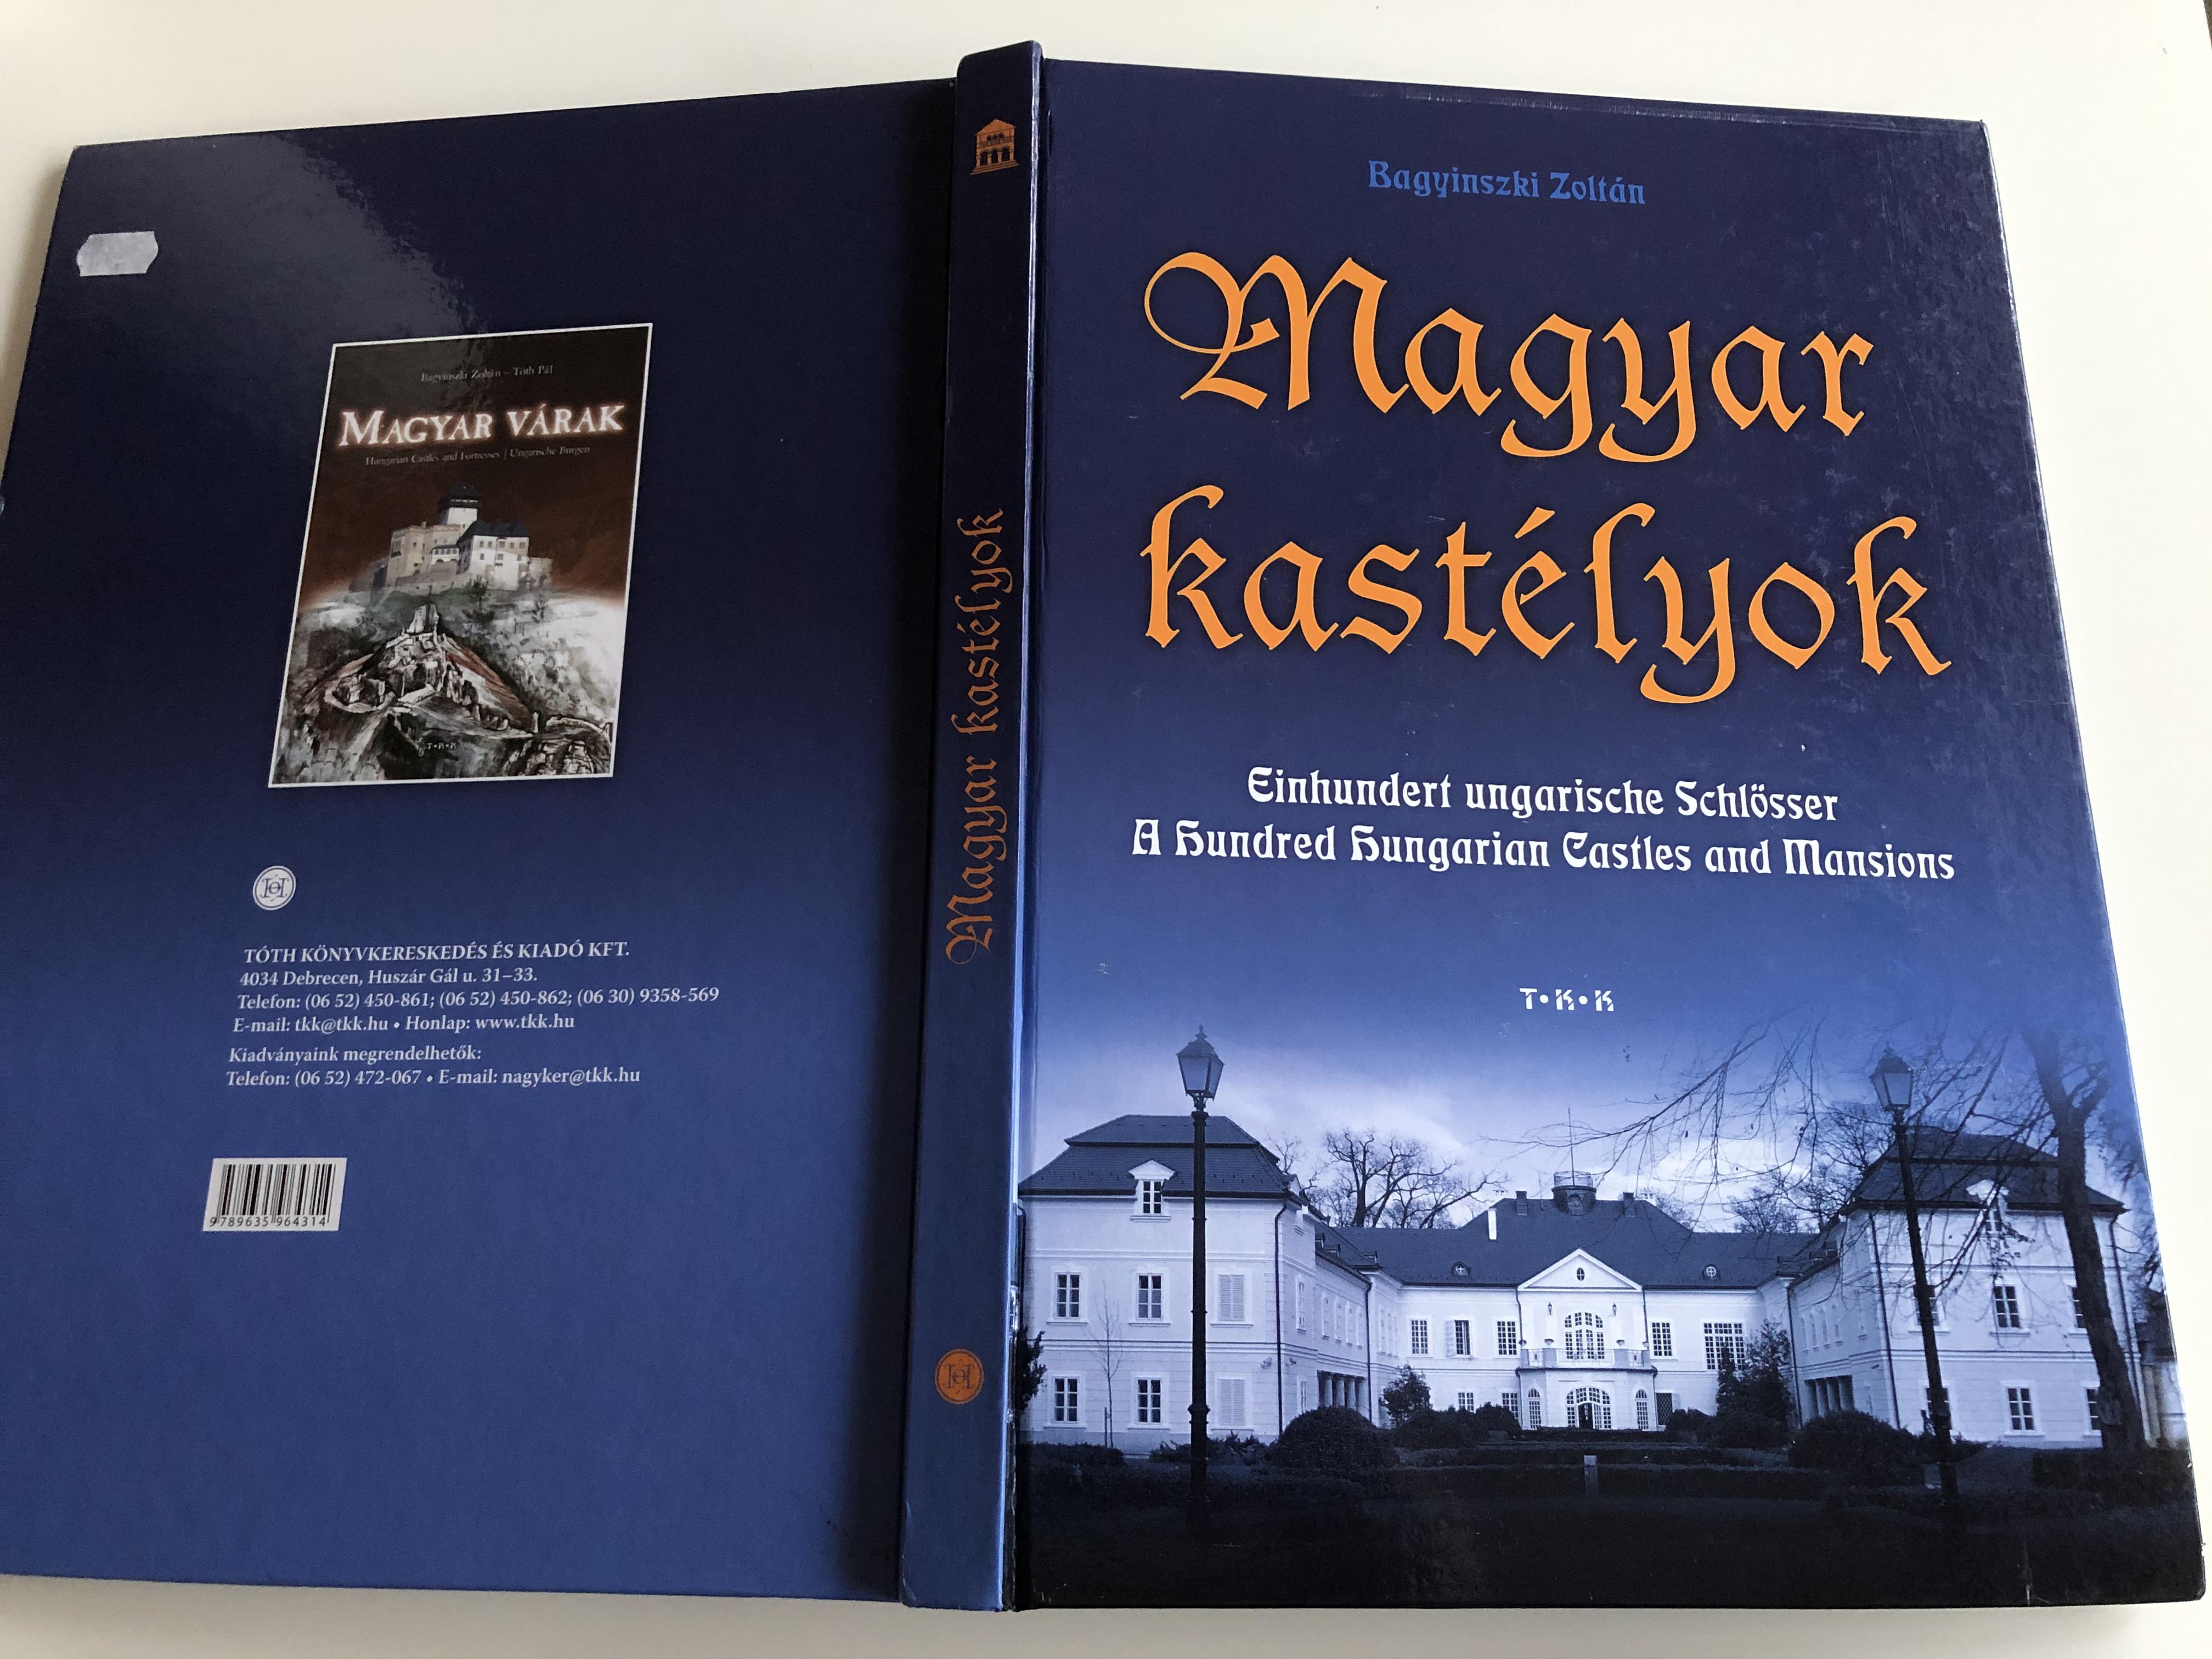 magyar-kast-lyok-by-bagyinski-zolt-n-one-hundred-hungarian-castles-and-mansions-21.jpg